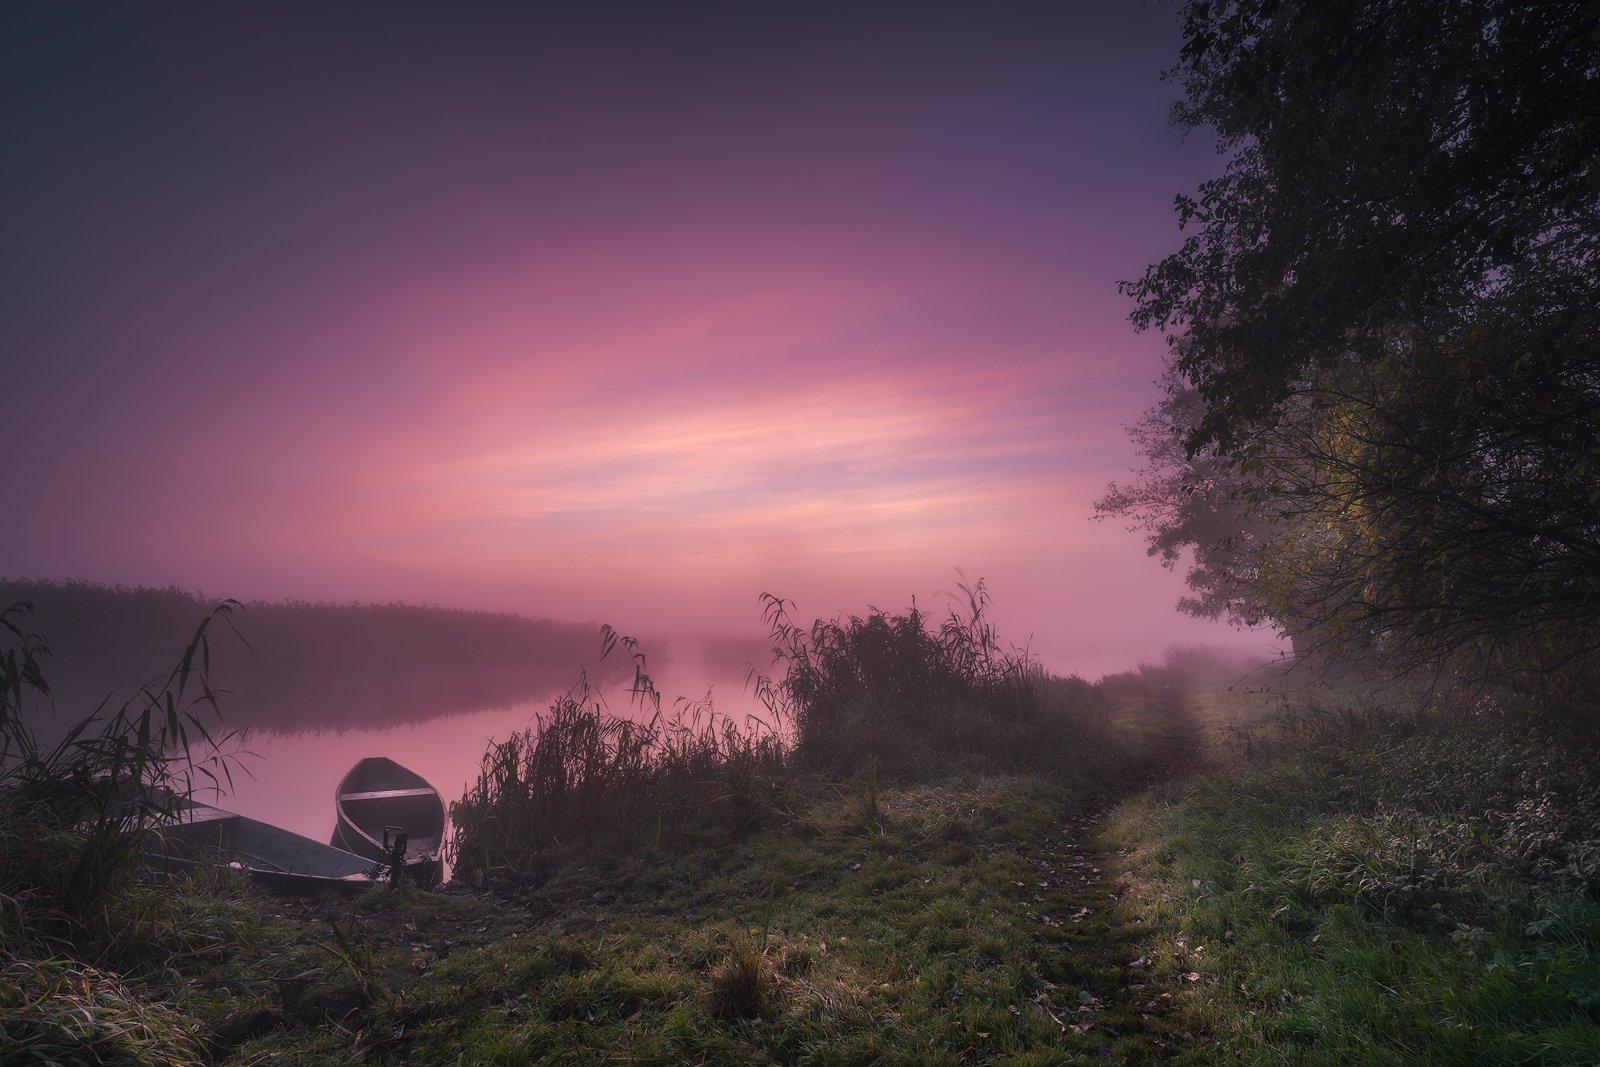 sky clouds fog river boats mist mood podlasie poland trees autumn, Maciej Warchoł